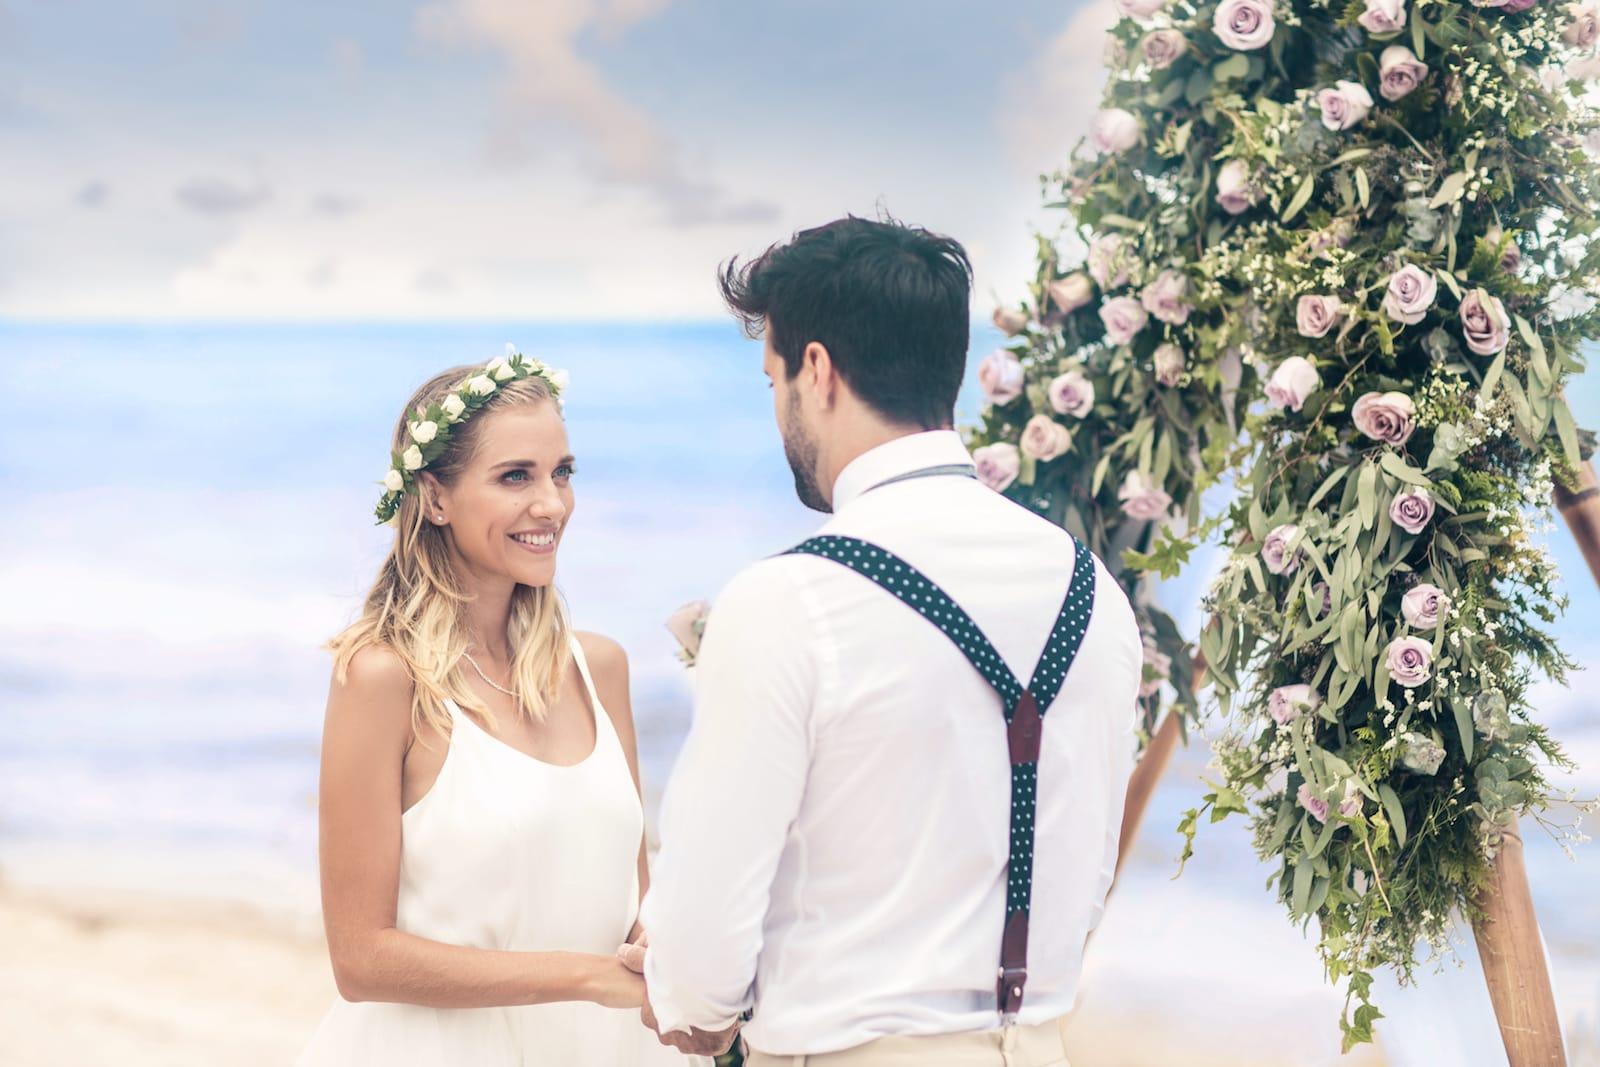 destination wedding exchange vows on beach adventure all inclusive resort mexico luxury romantic vacation